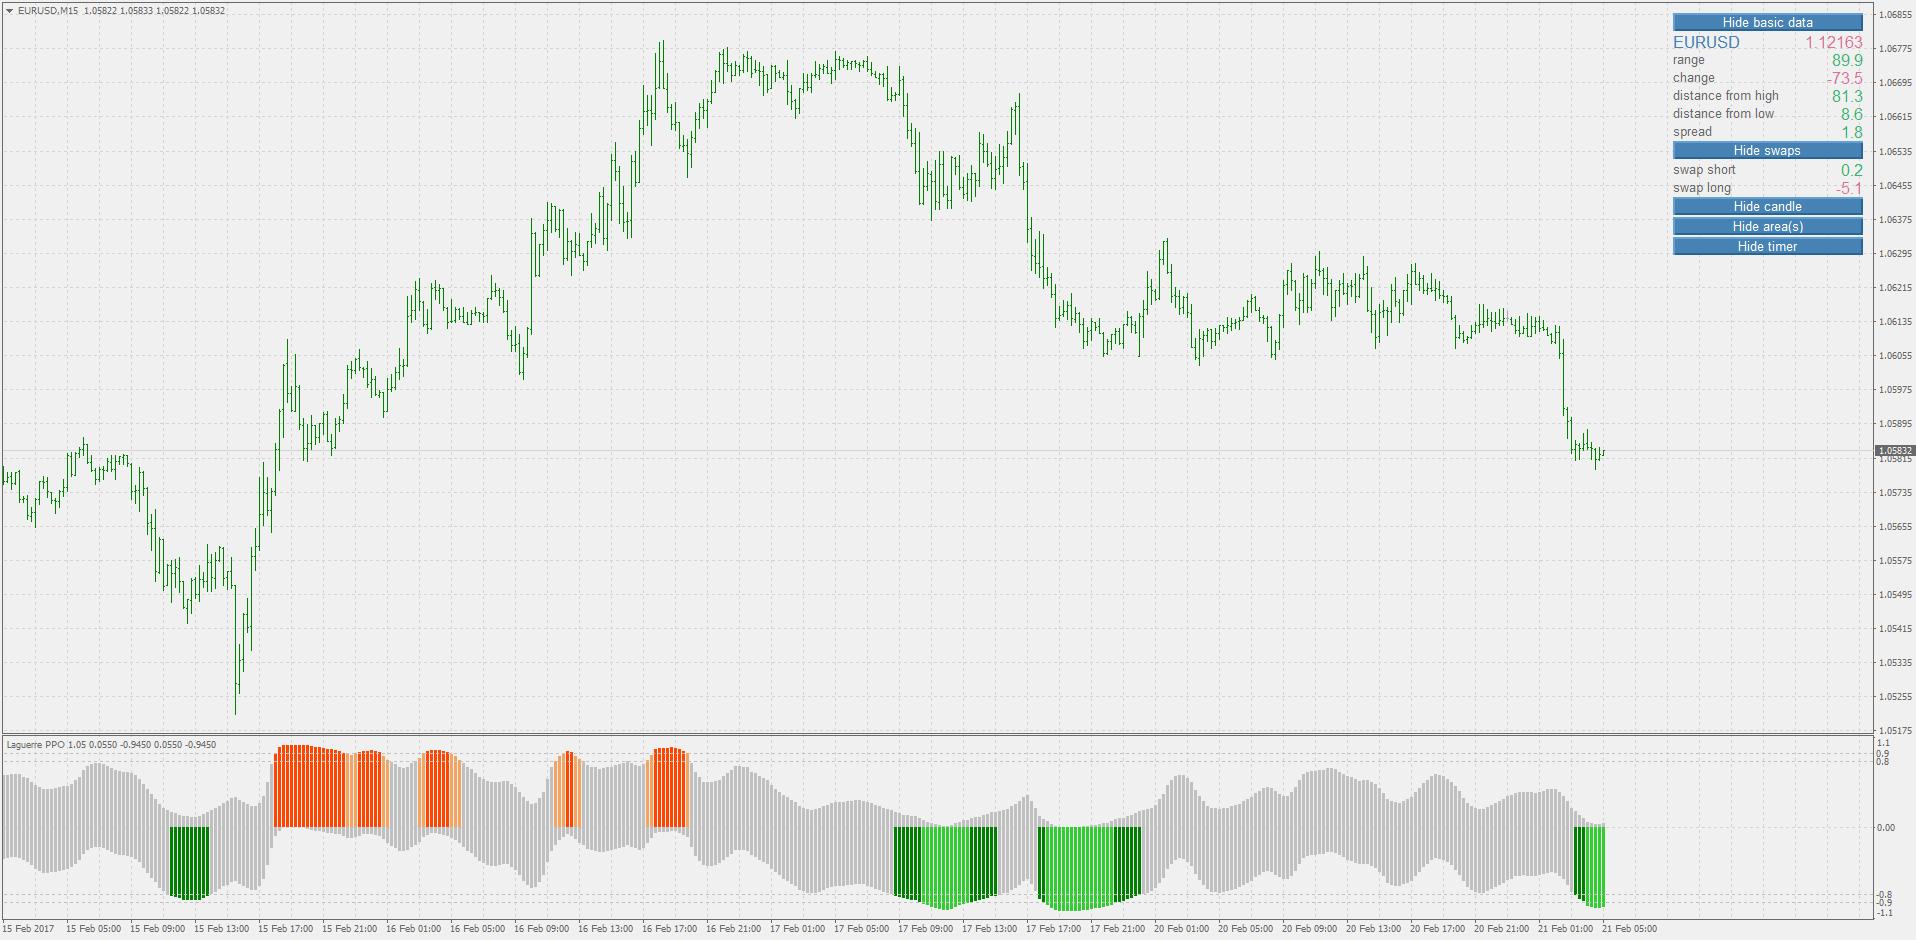 MT4 Lagguerre PPO (Price Percentage Oscillator) Reversal